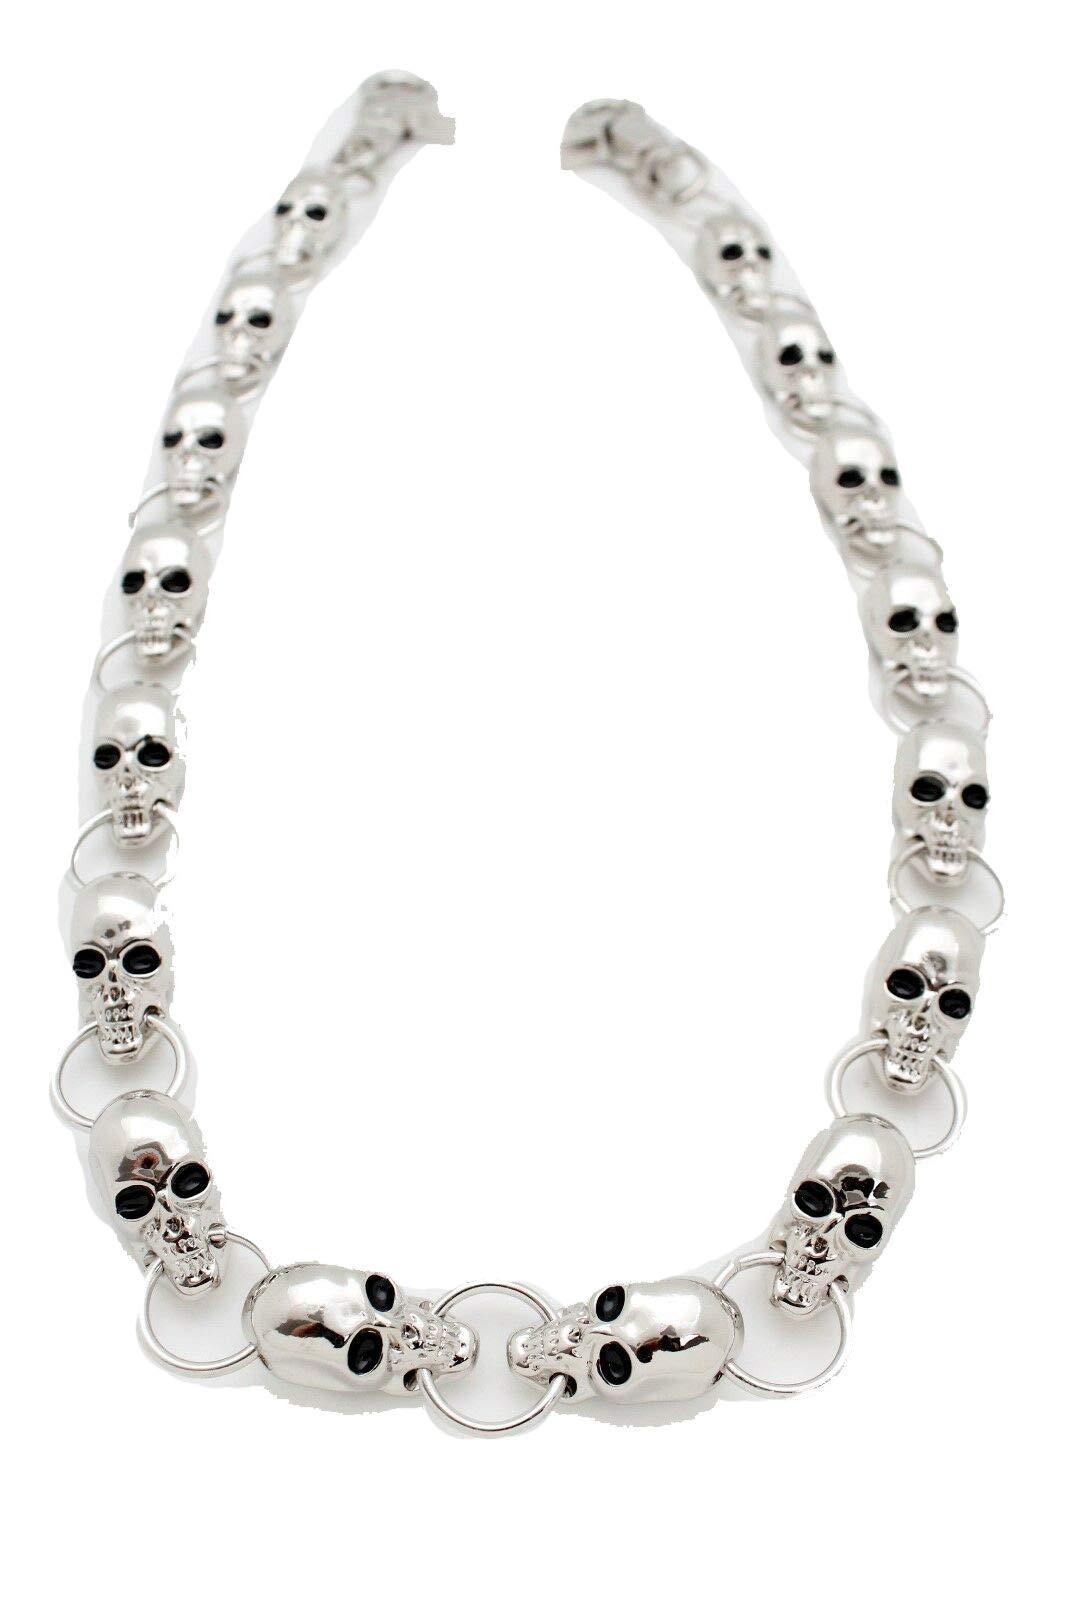 TFJ Men's Fashion Wallet Chain Links Big Skulls Silver Metal Keychain Clasp Ring